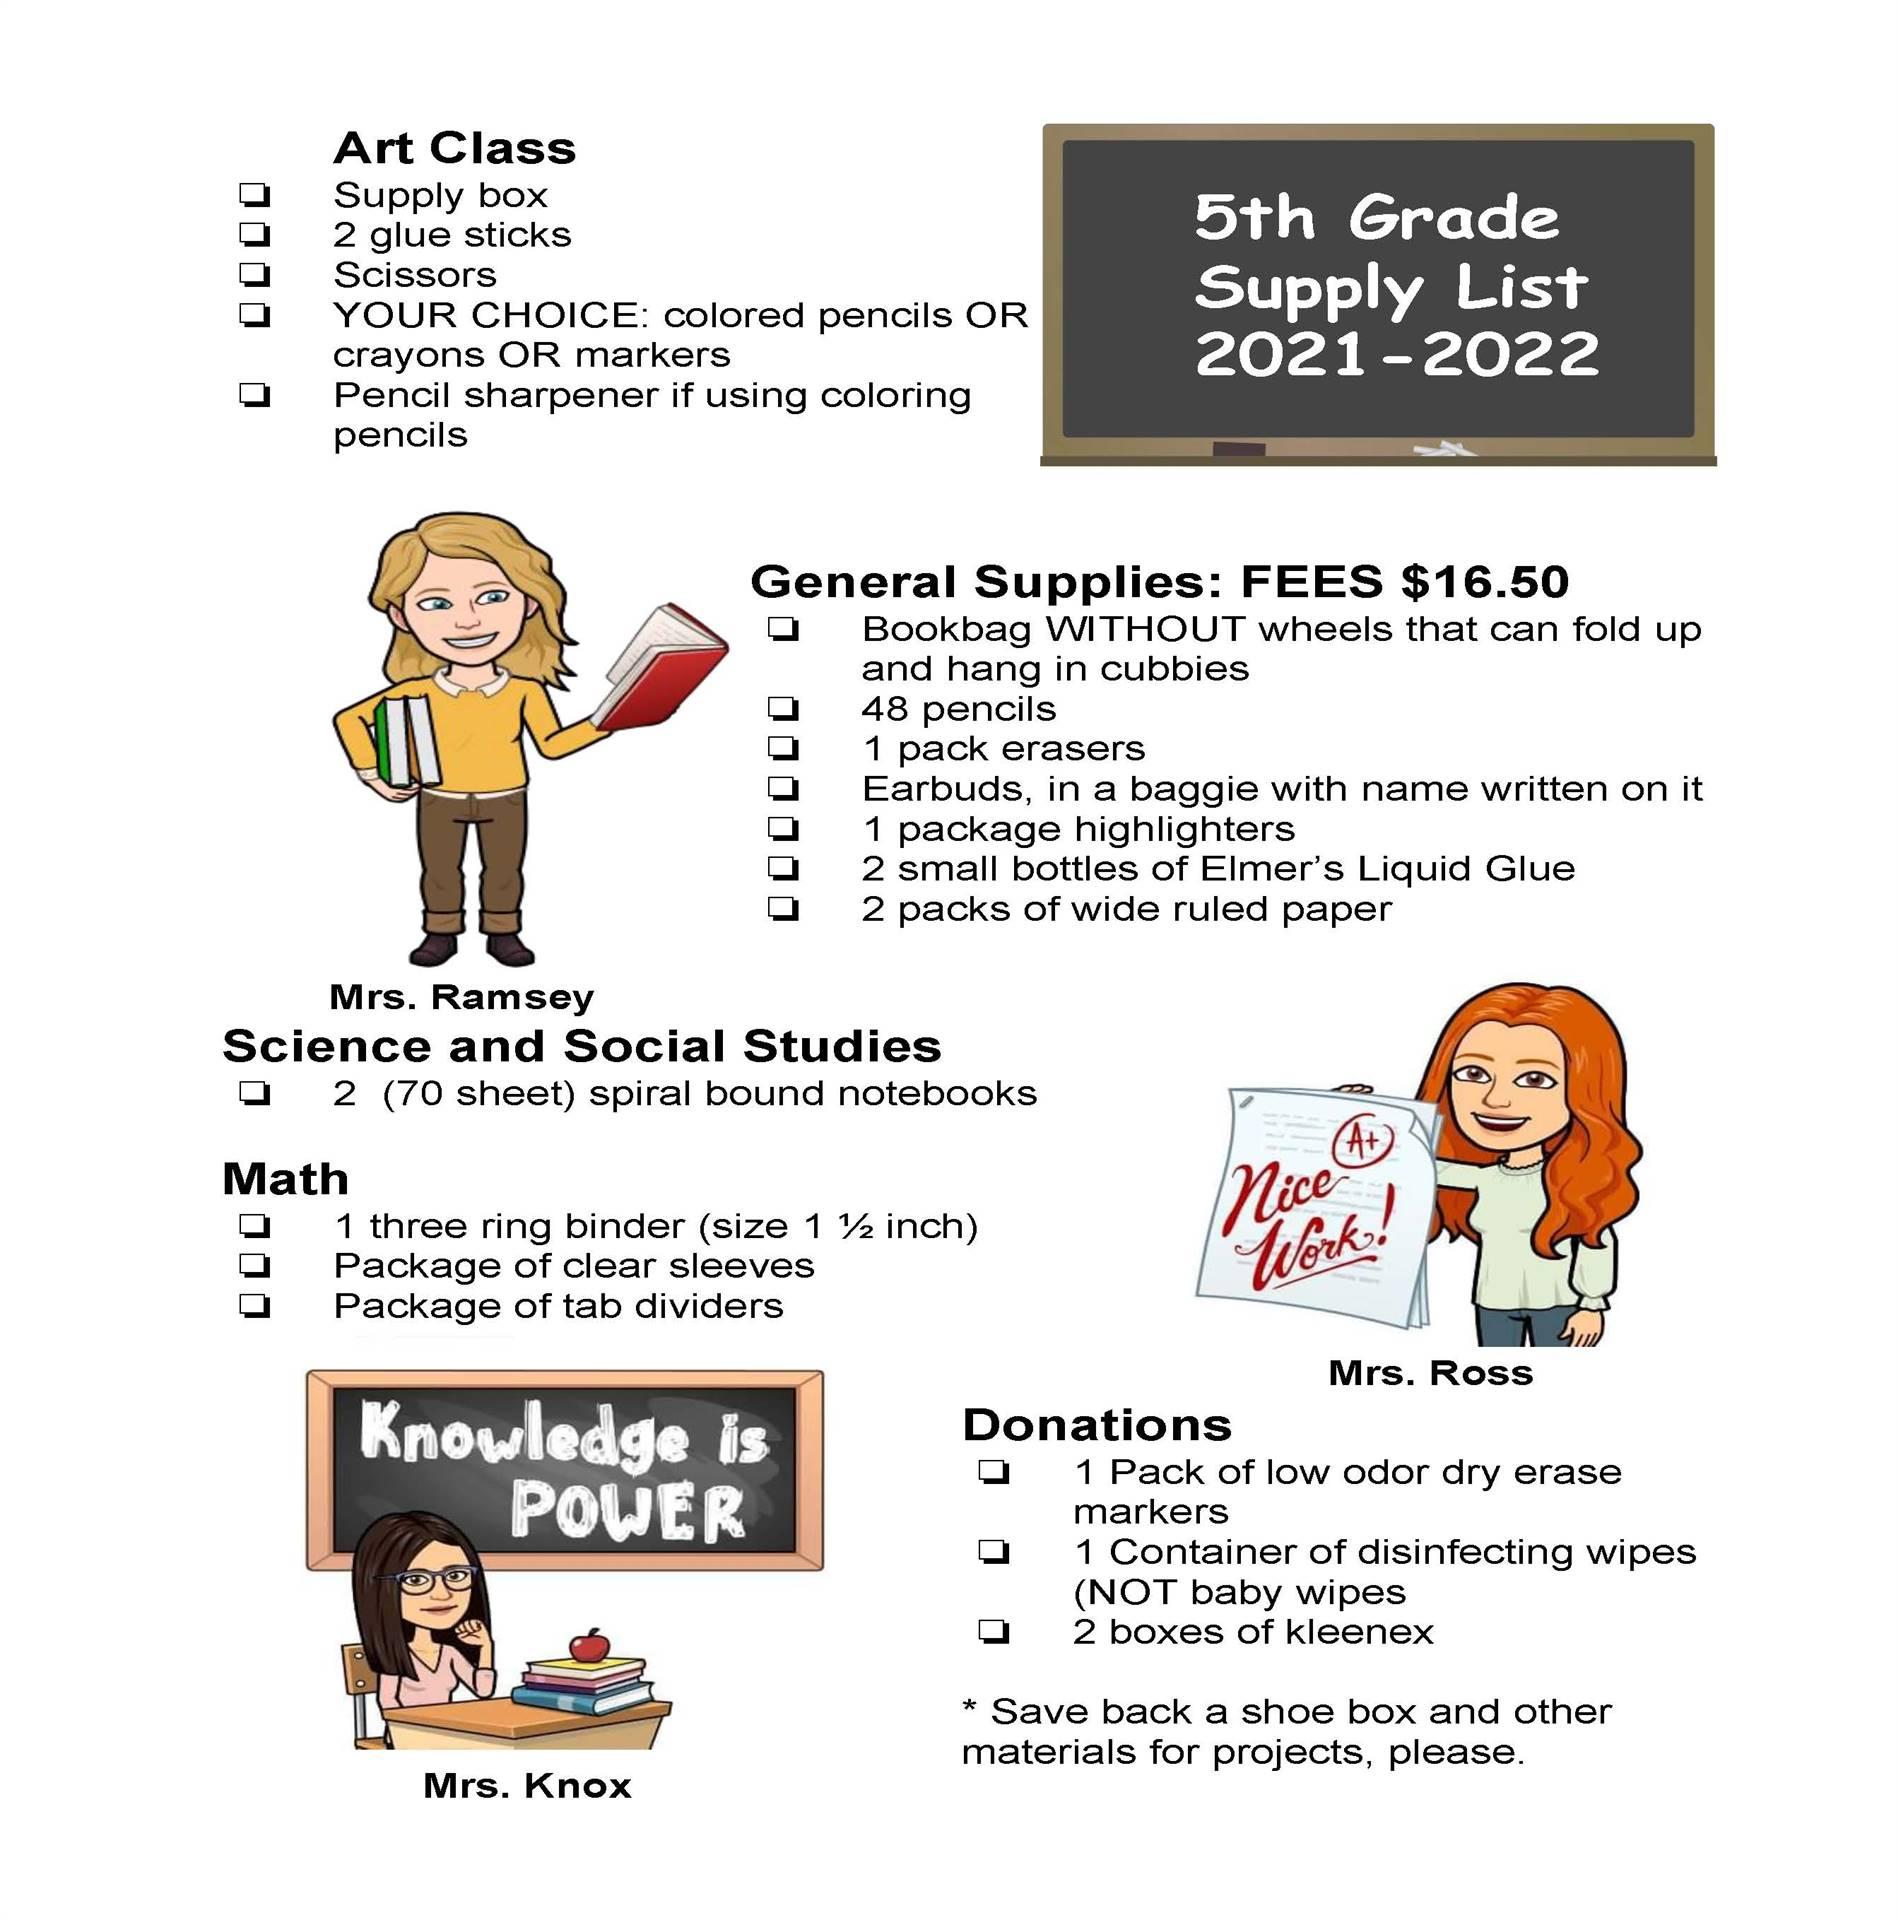 South - 5th Grade Supply List